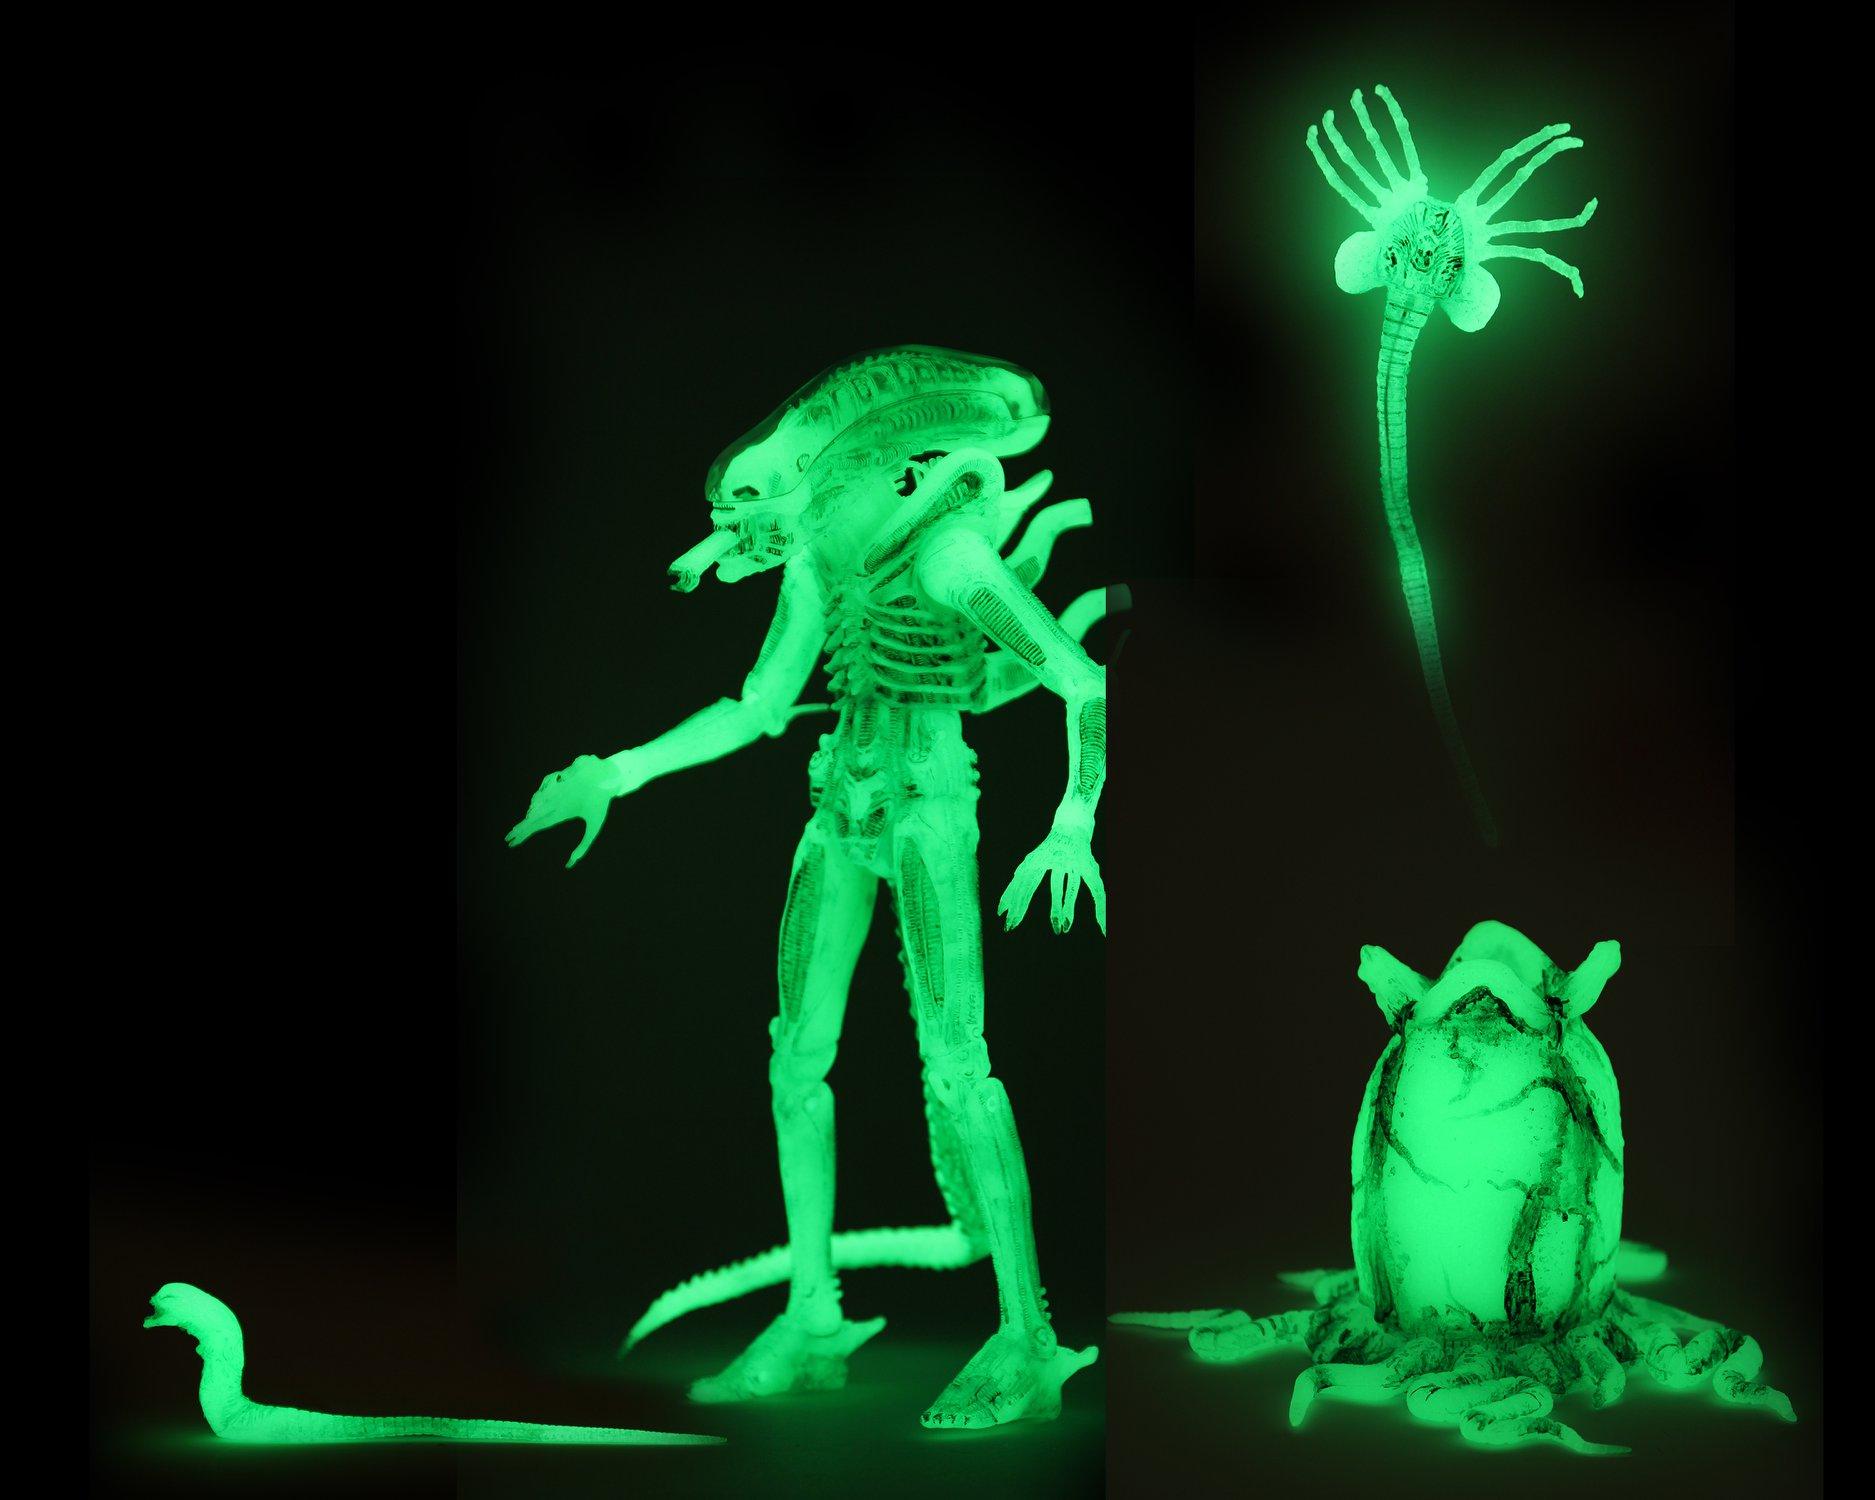 NECA Toys San Diego Comic-Con 2020 Exclusive – Alien Ultimate Big Chap Glow in the Dark 7″ Scale Figure